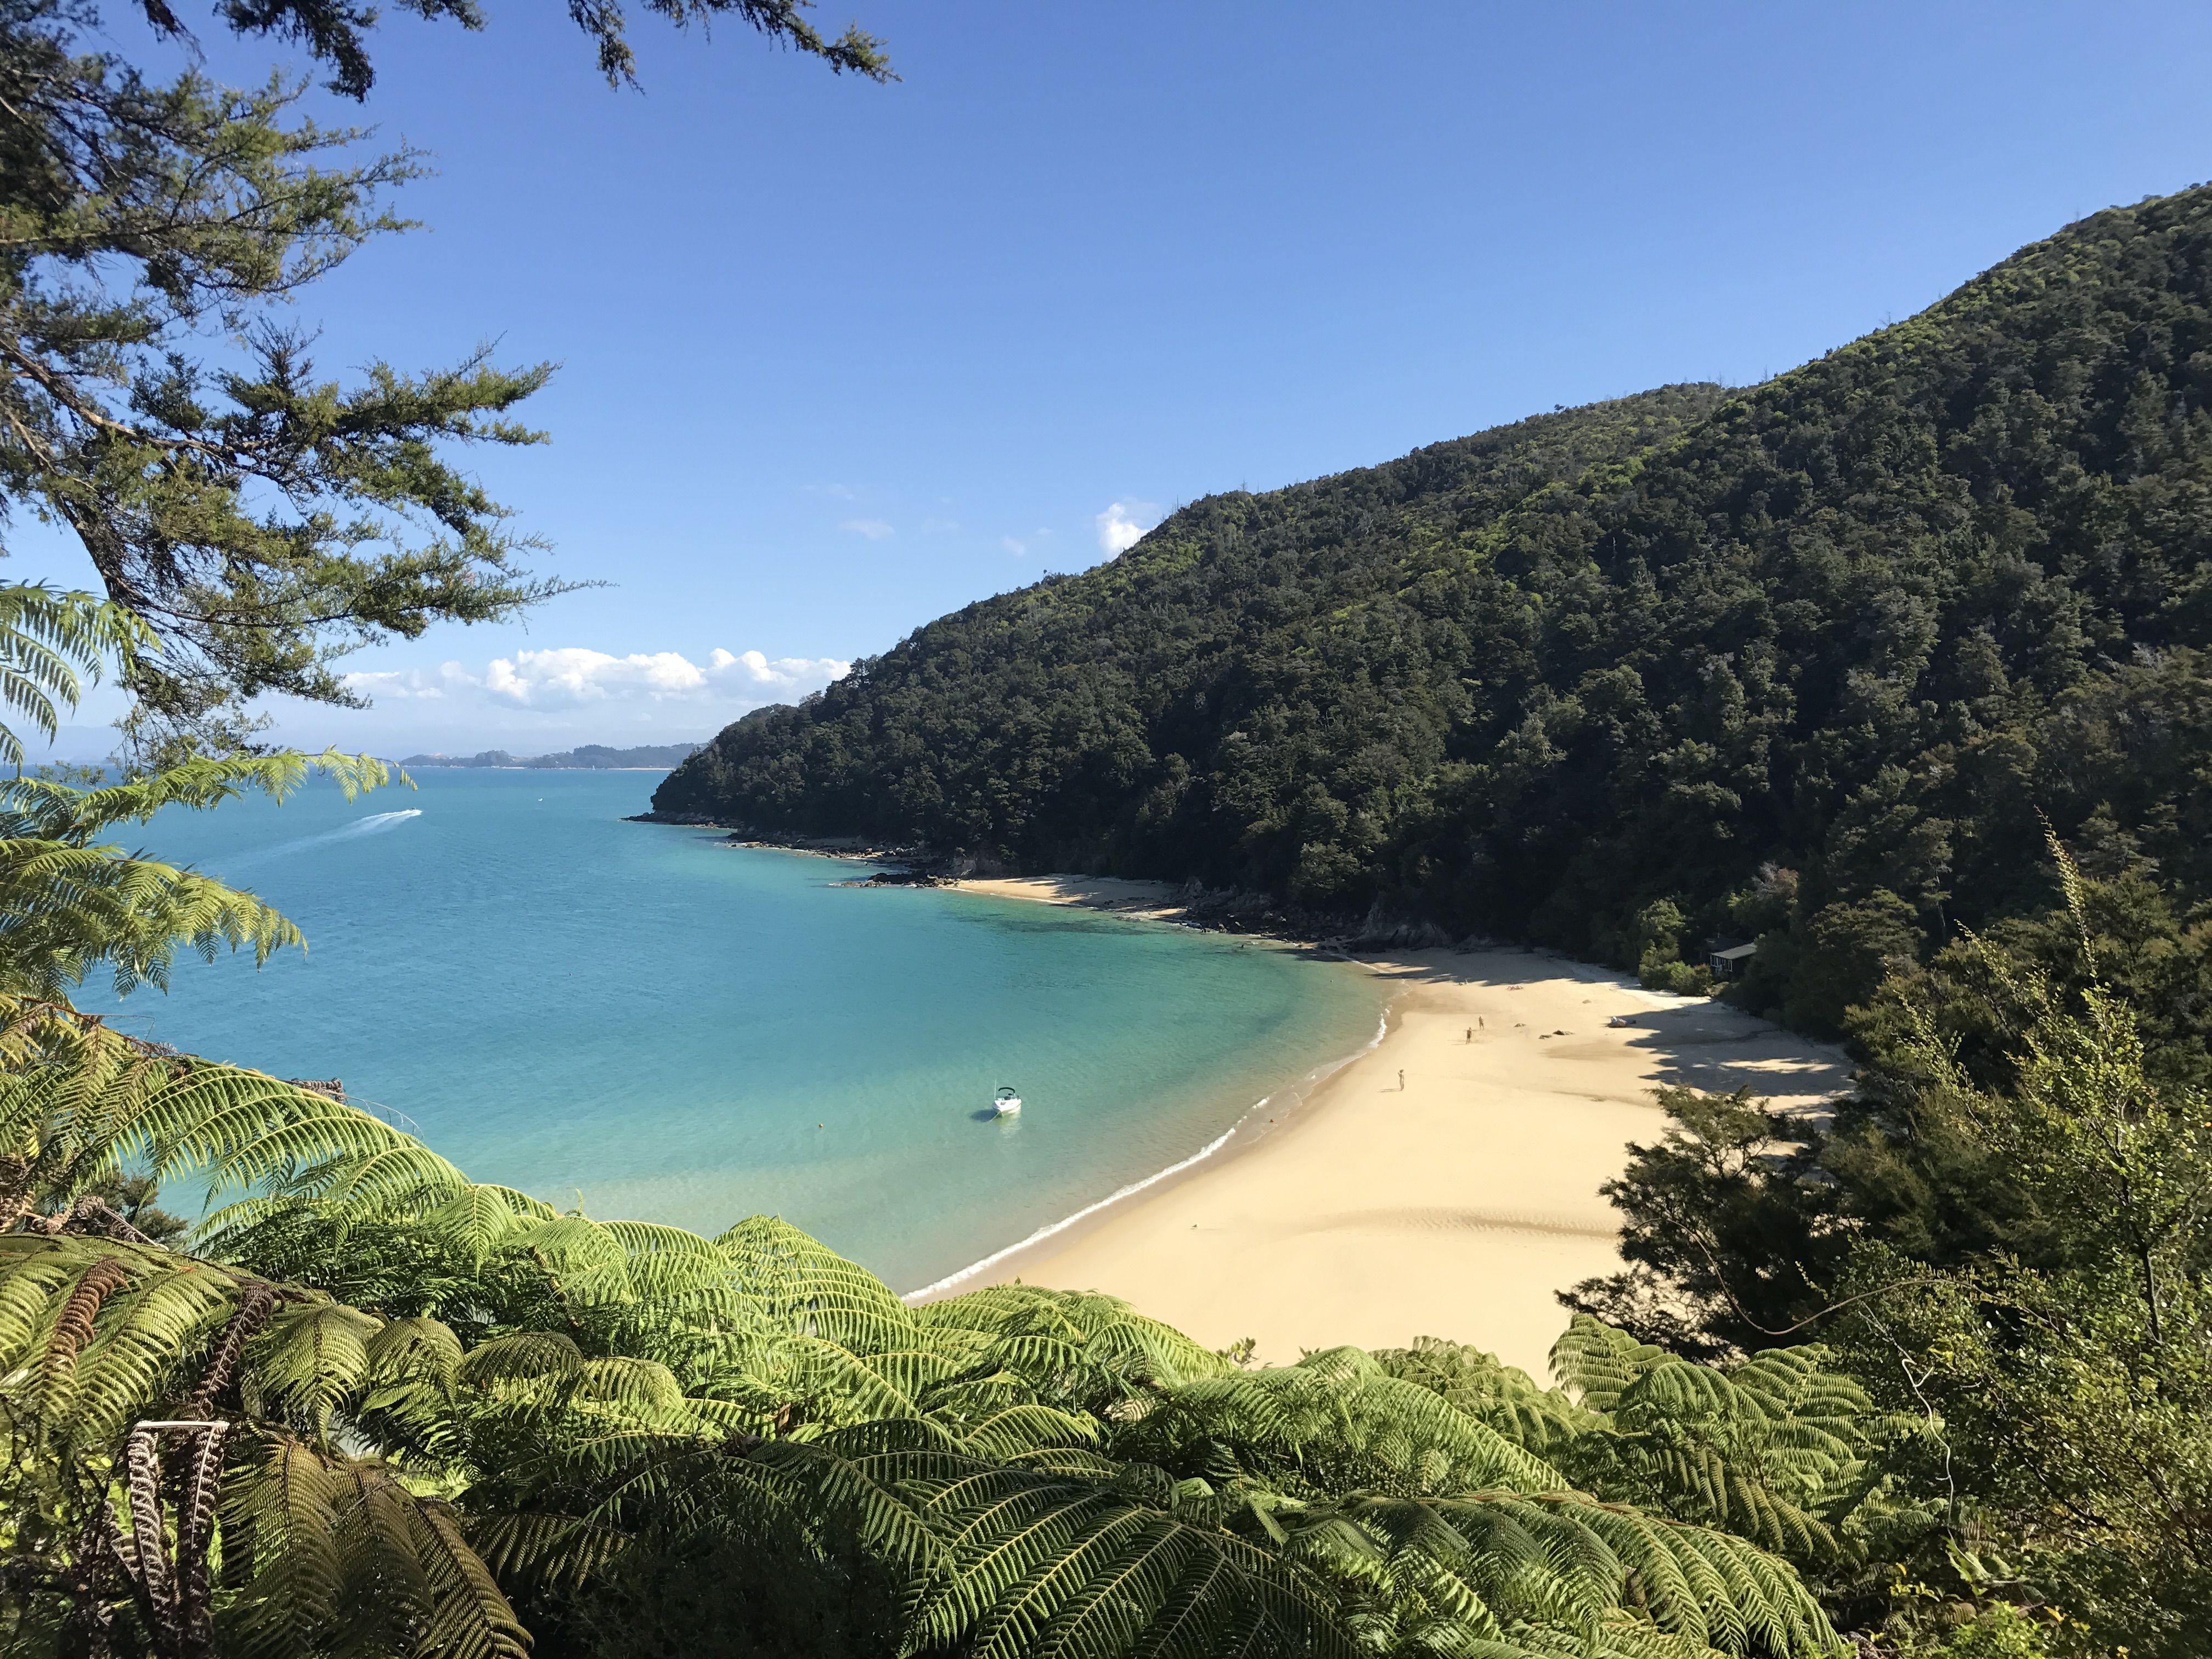 Fiordland National Park, NZ | Travel, National parks